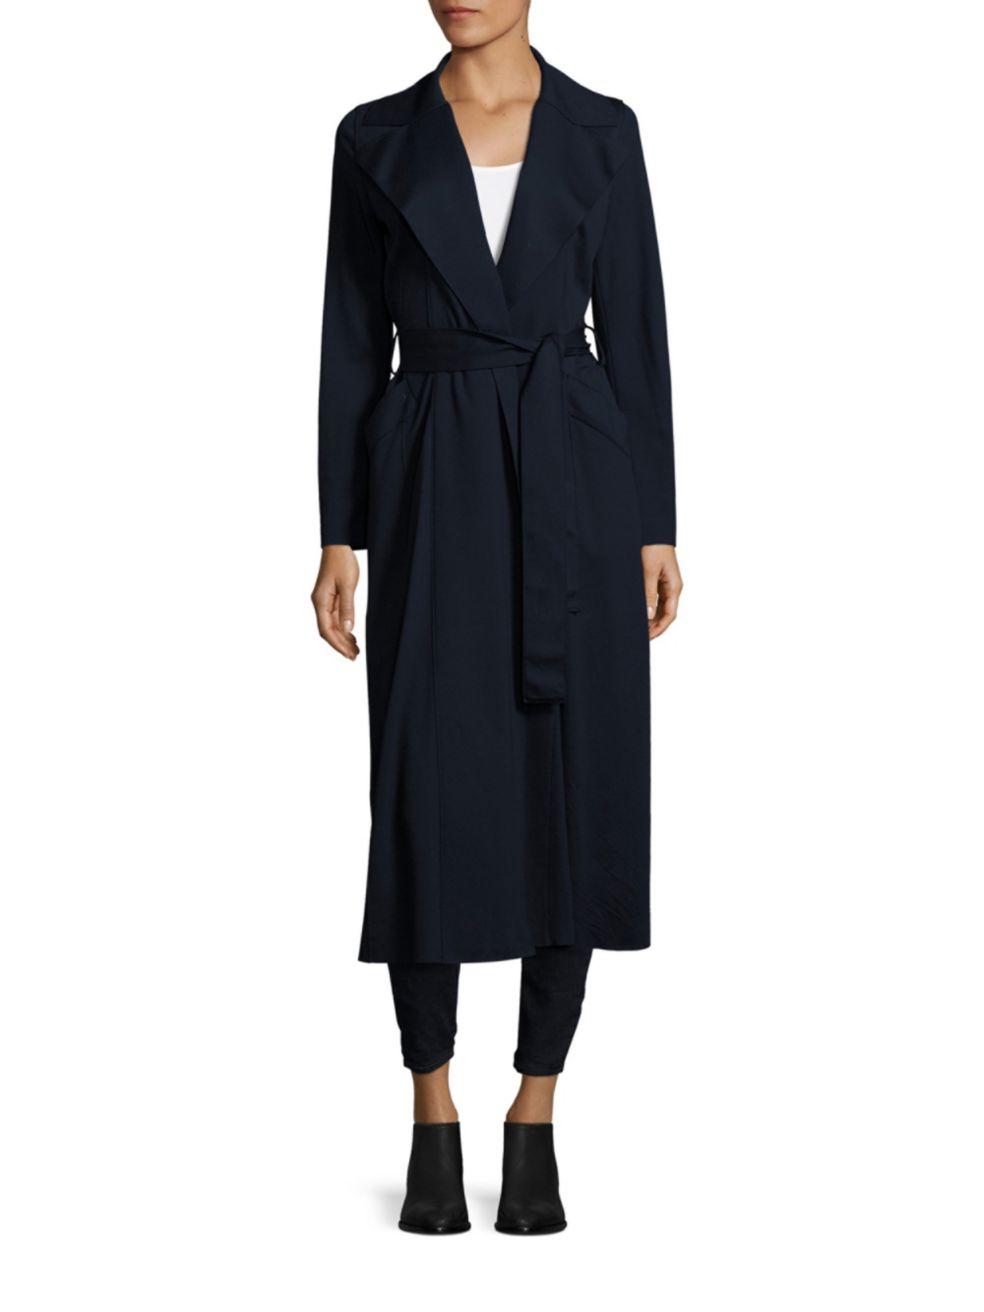 Harris Wharf London Solid Duster Coat